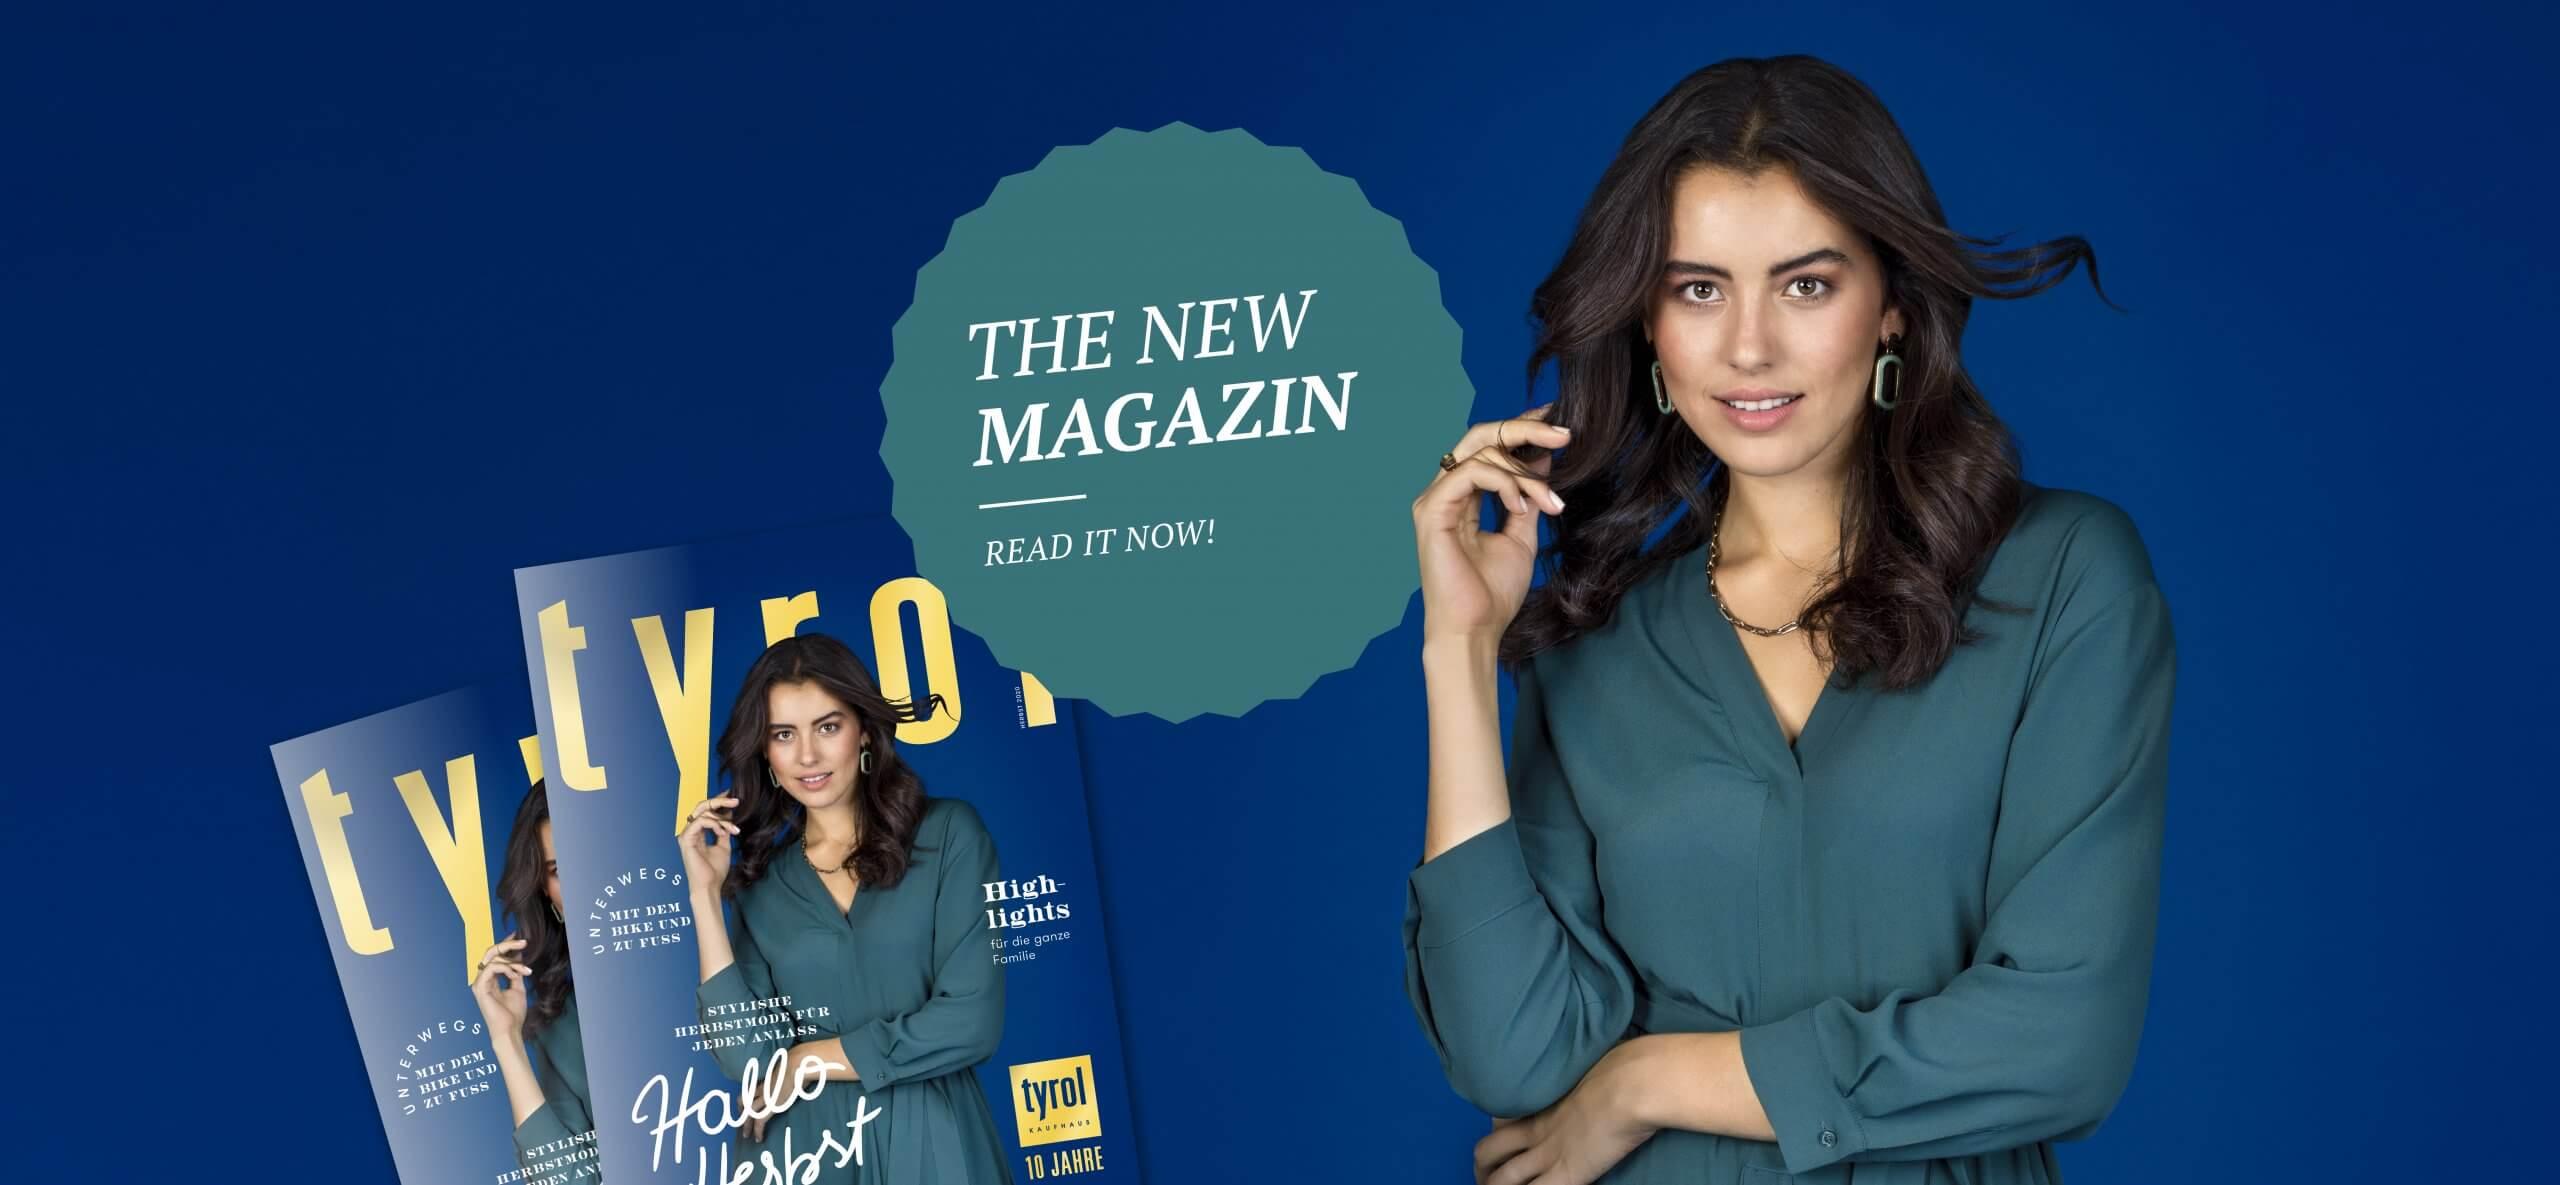 The new Magazine